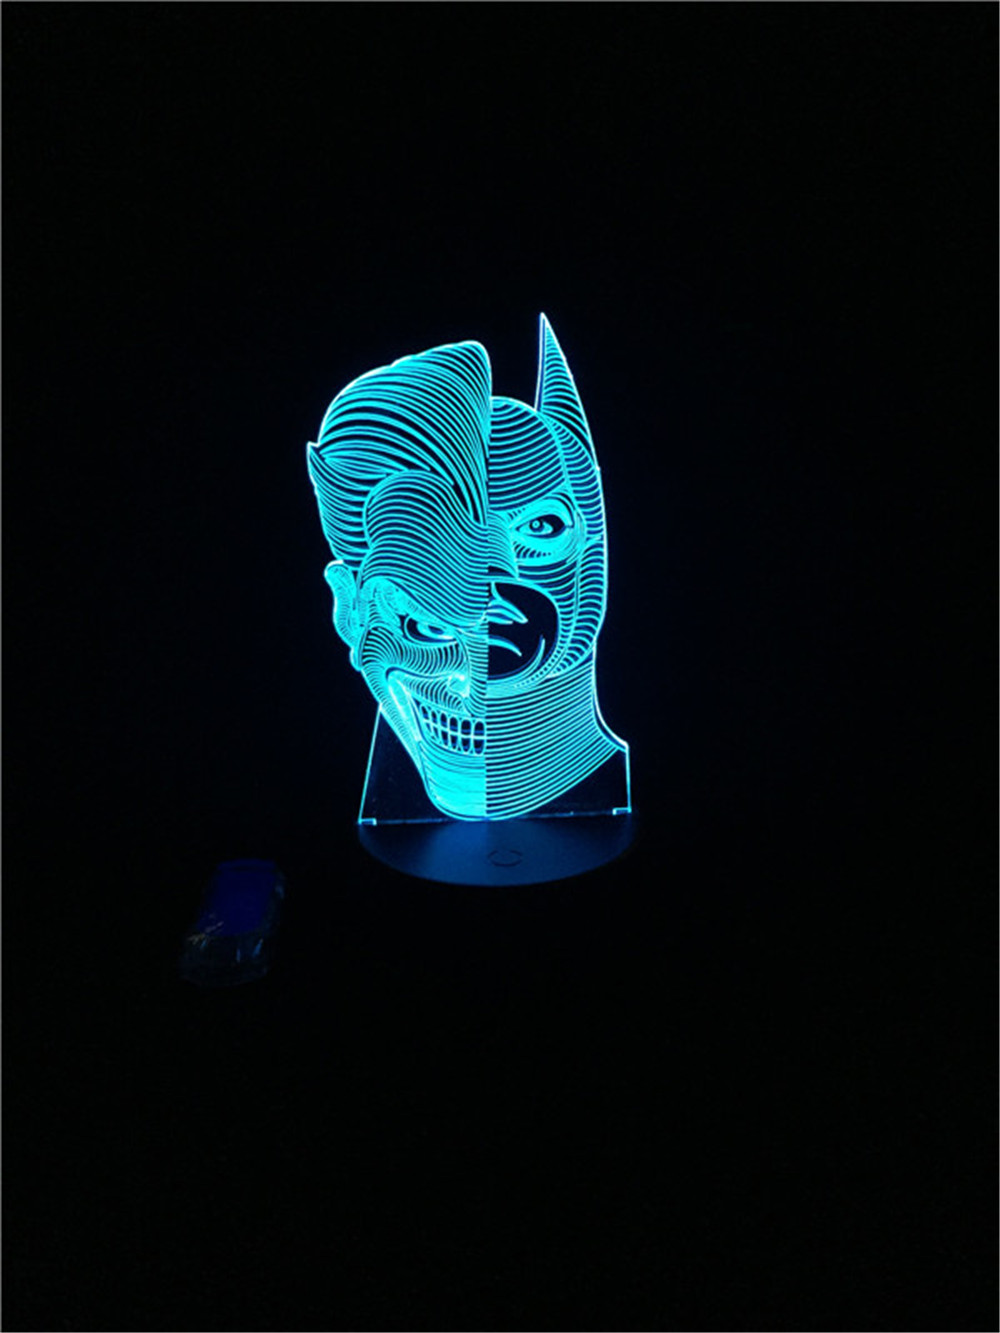 Luzes da Noite legal 3d superhero two-face joker Function 4 : Lampada Led/lamparas/led Lamp Indoor